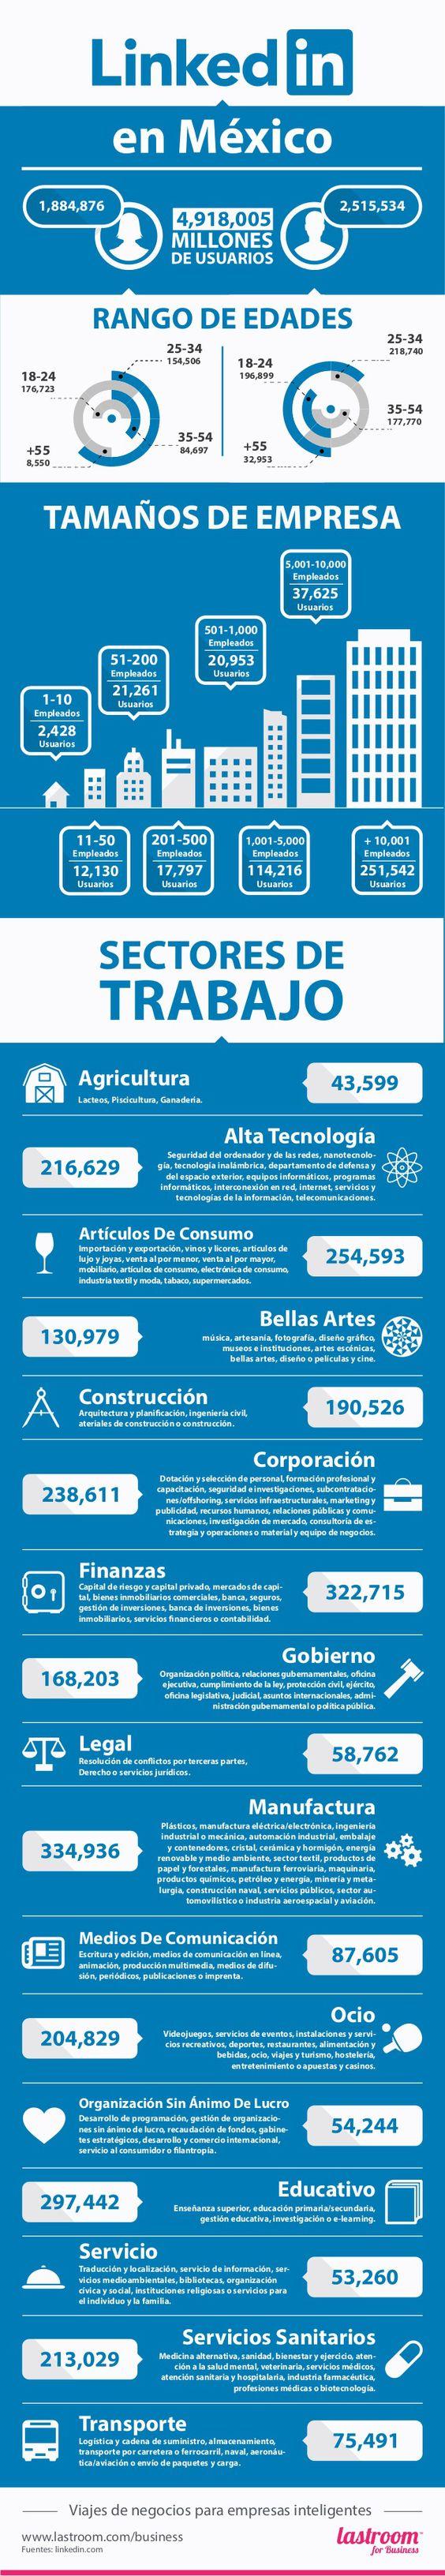 Linkedin en México #infografia